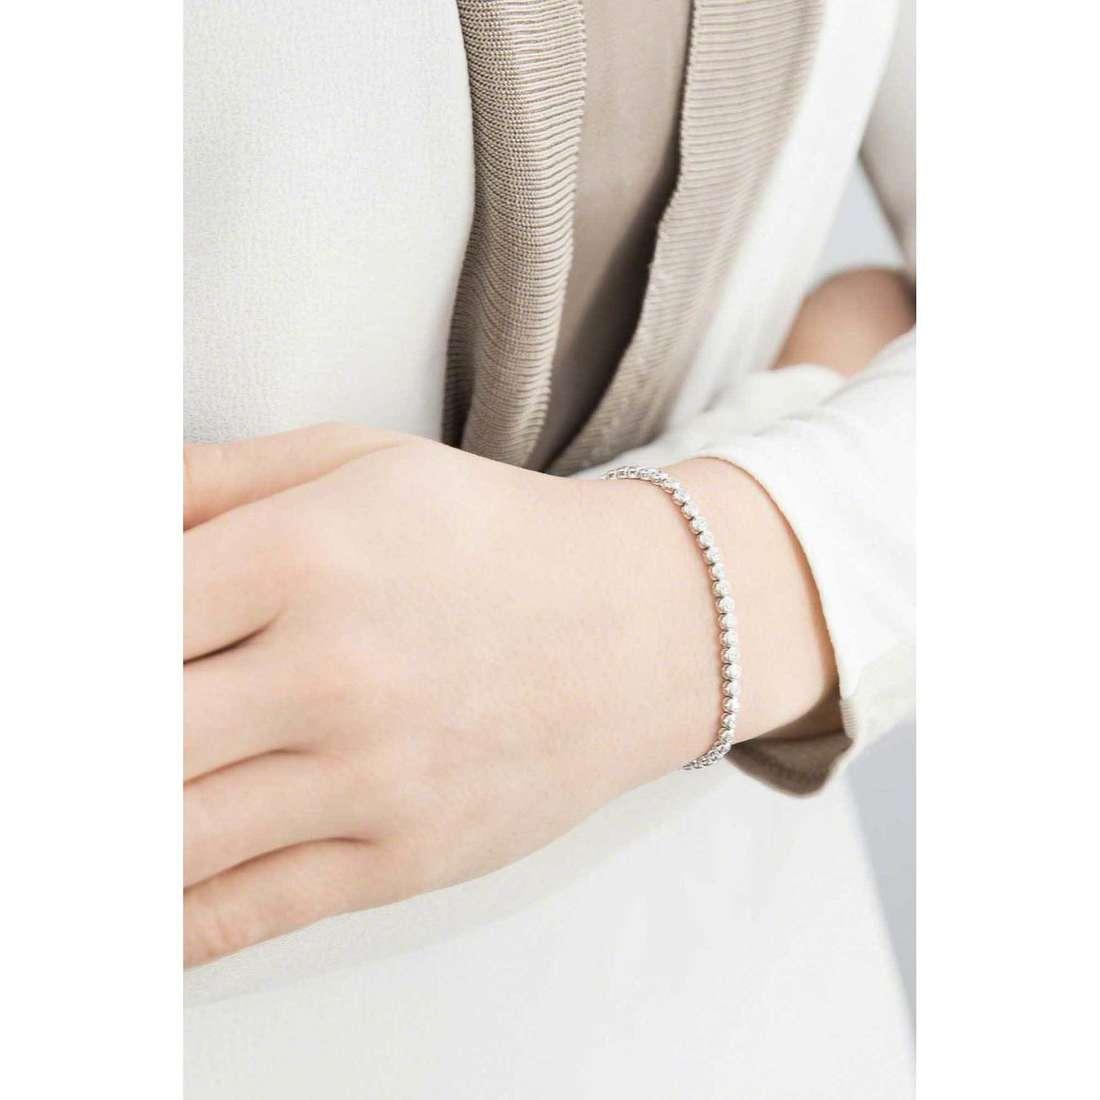 GioiaPura bracciali donna 19865-01-16 indosso